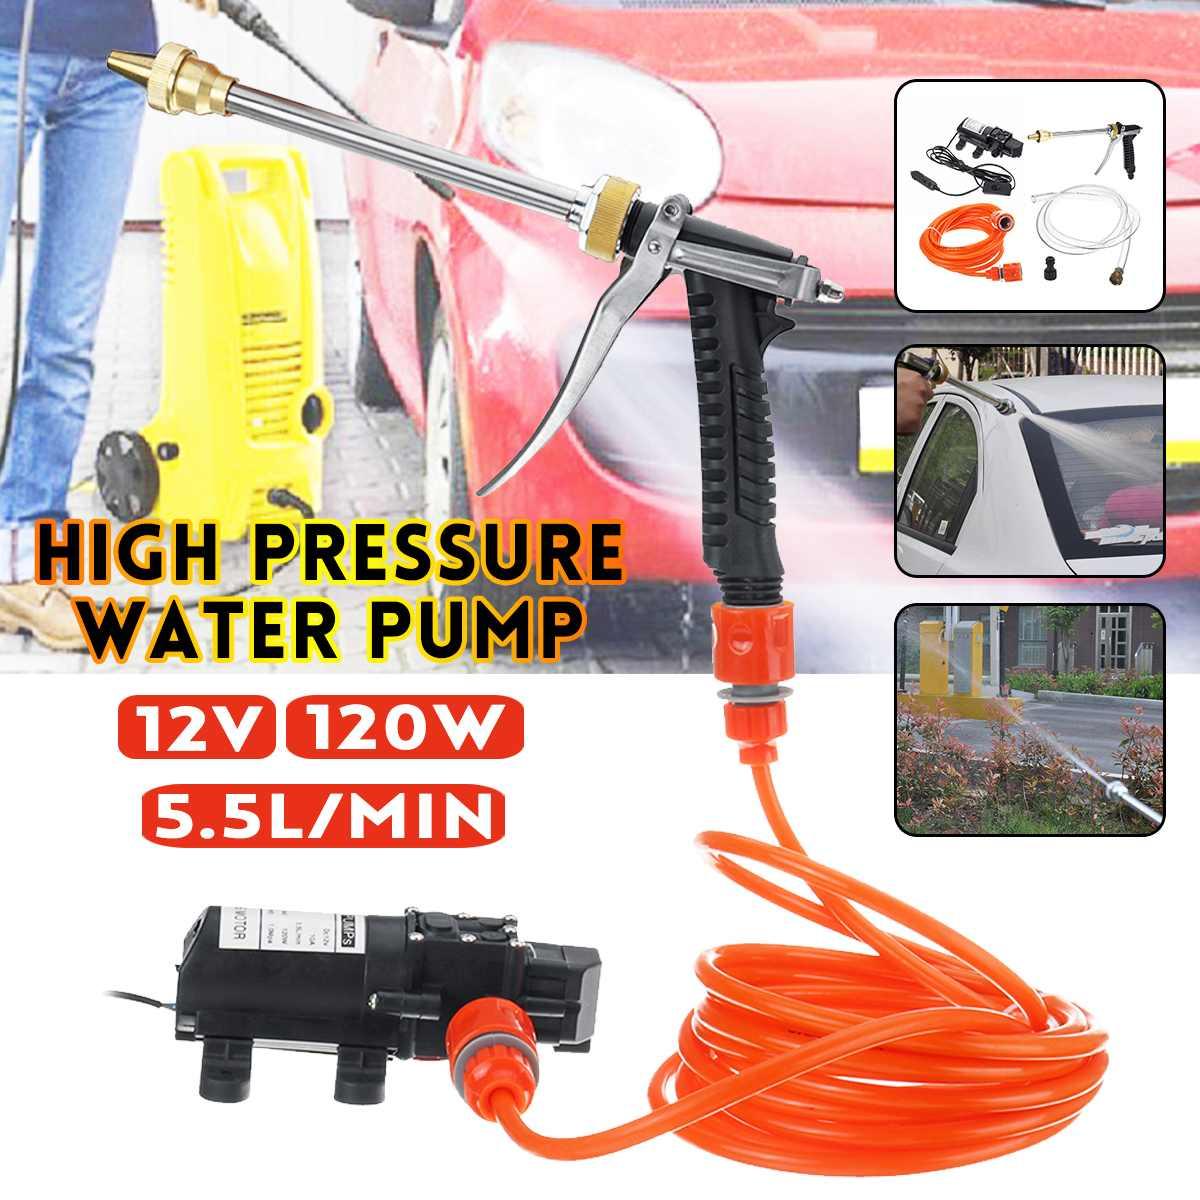 12V 120W High Pressure Car Electric Washer Wash Pump Set Car Washer Pump Portable Auto Washing Machine Kit Washer Sprayer